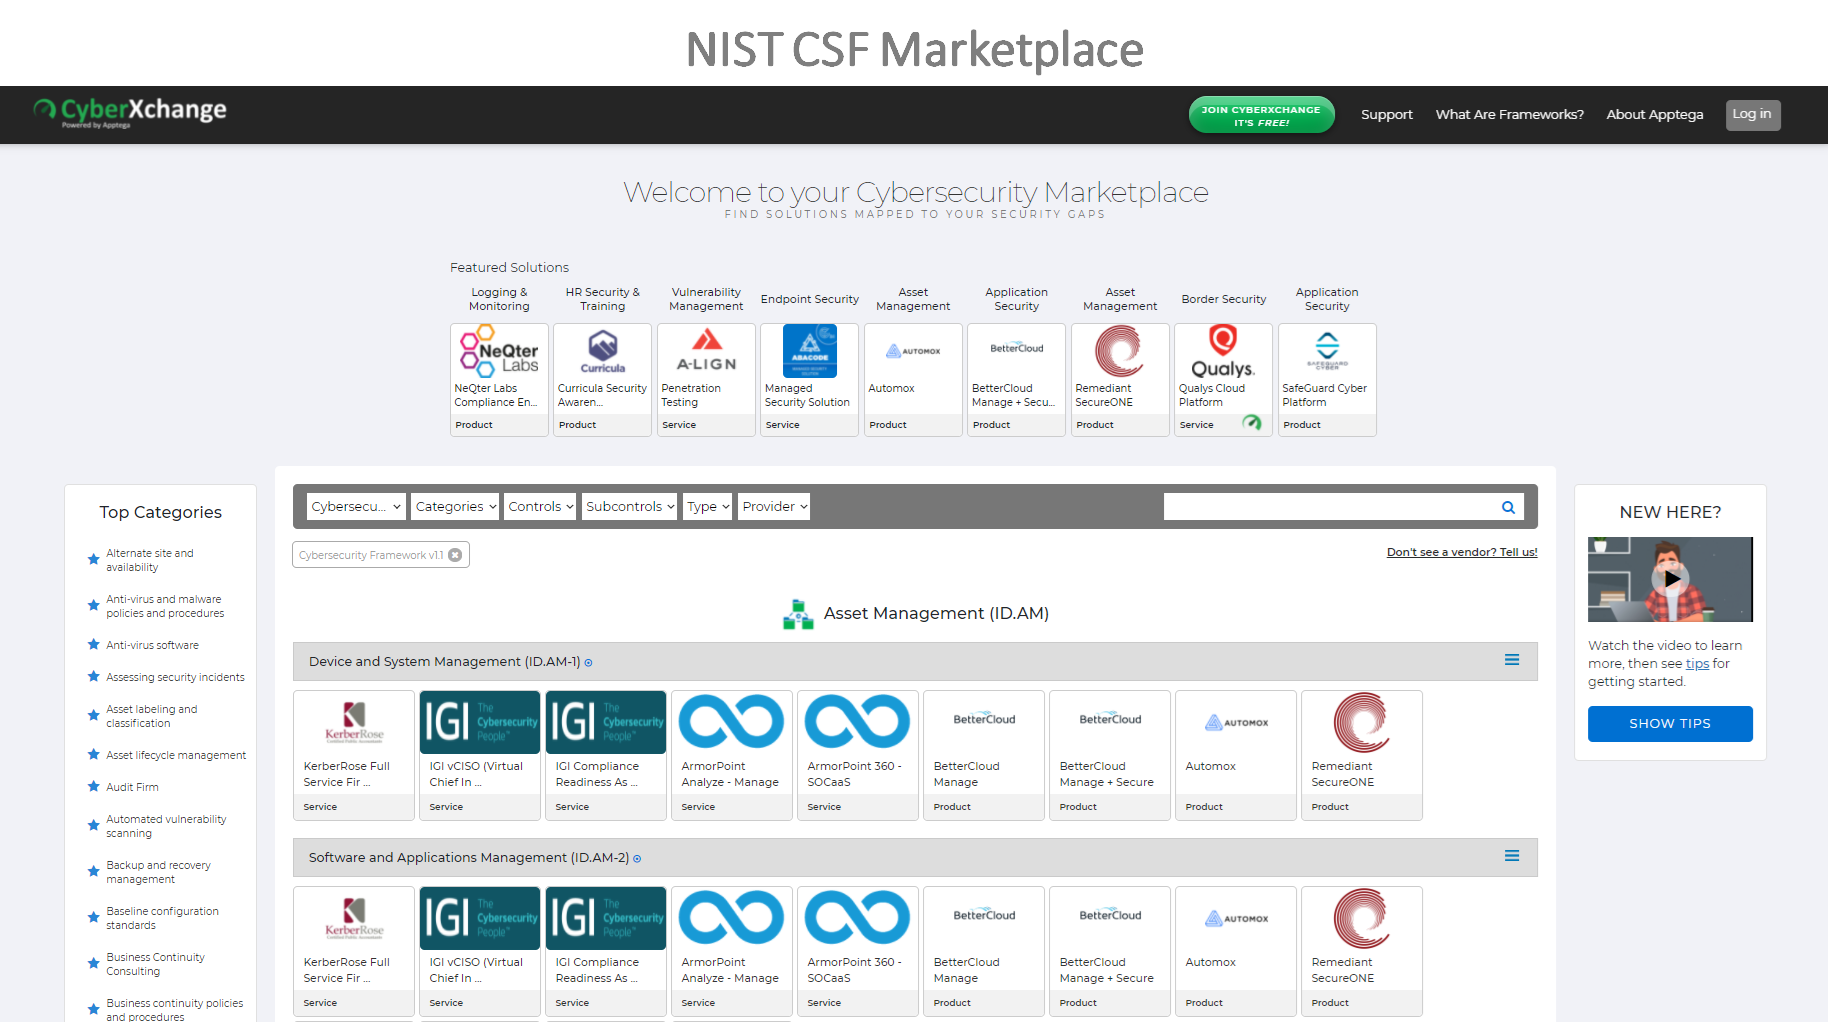 NIST CSF Marketplace